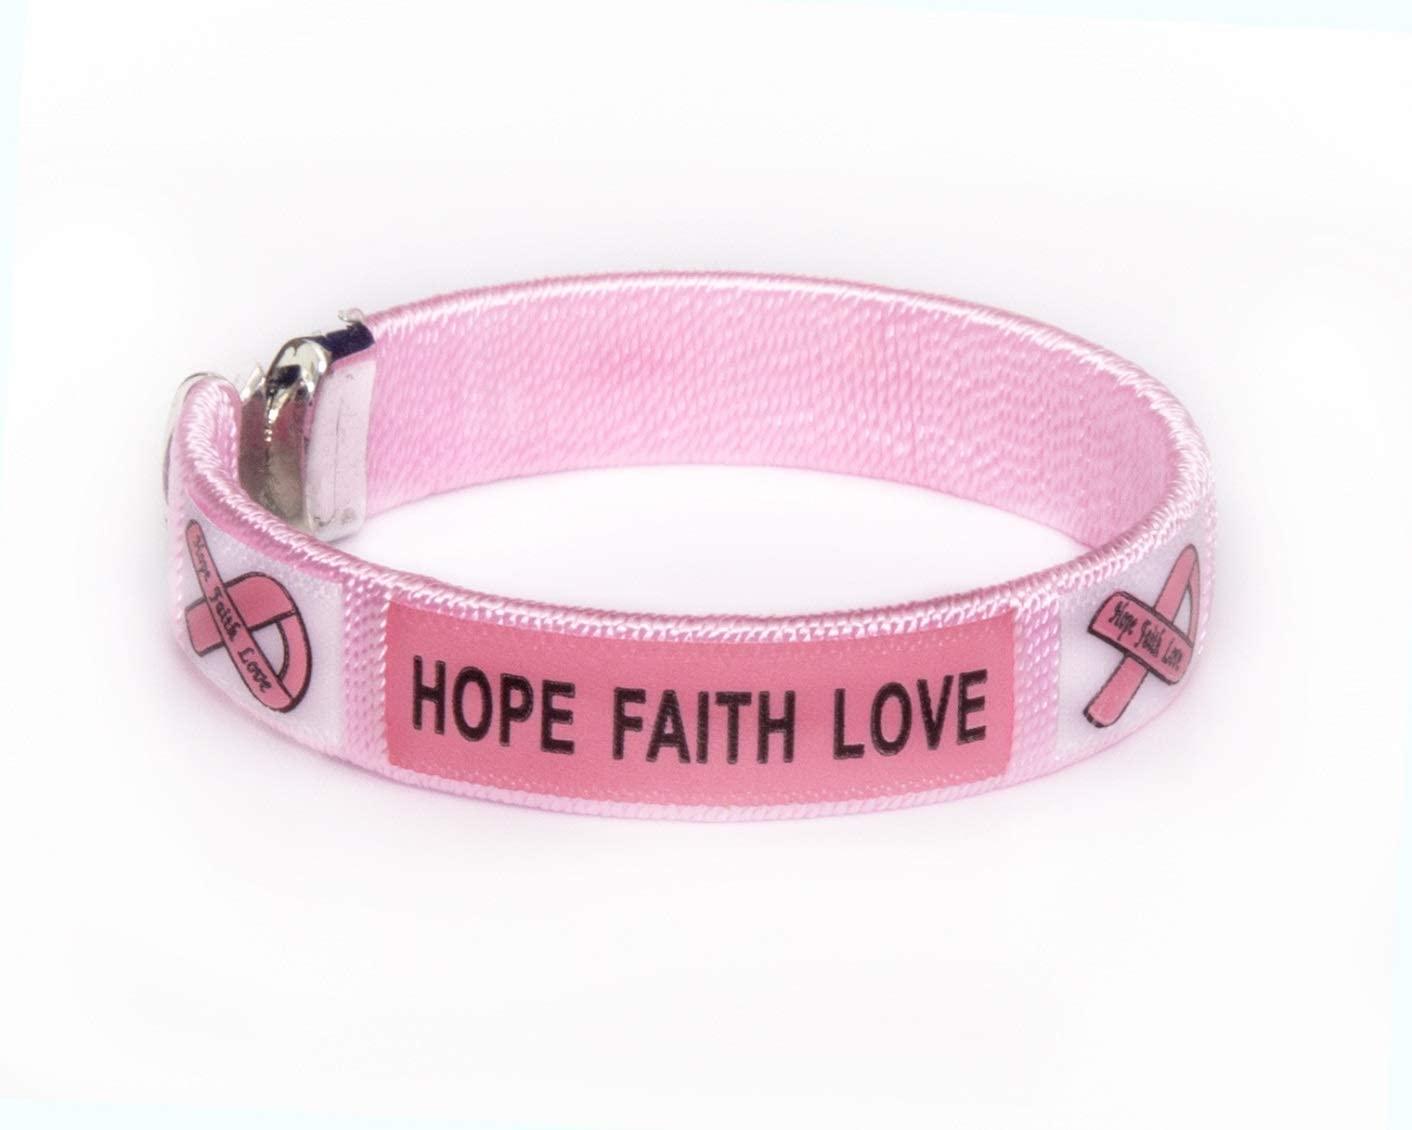 Fundraising For A Cause   Breast Cancer Awareness Bangle Bracelets - Pink Ribbon Bangle Bracelets for Breast Cancer Awareness Fundraisers (25 Bracelets)